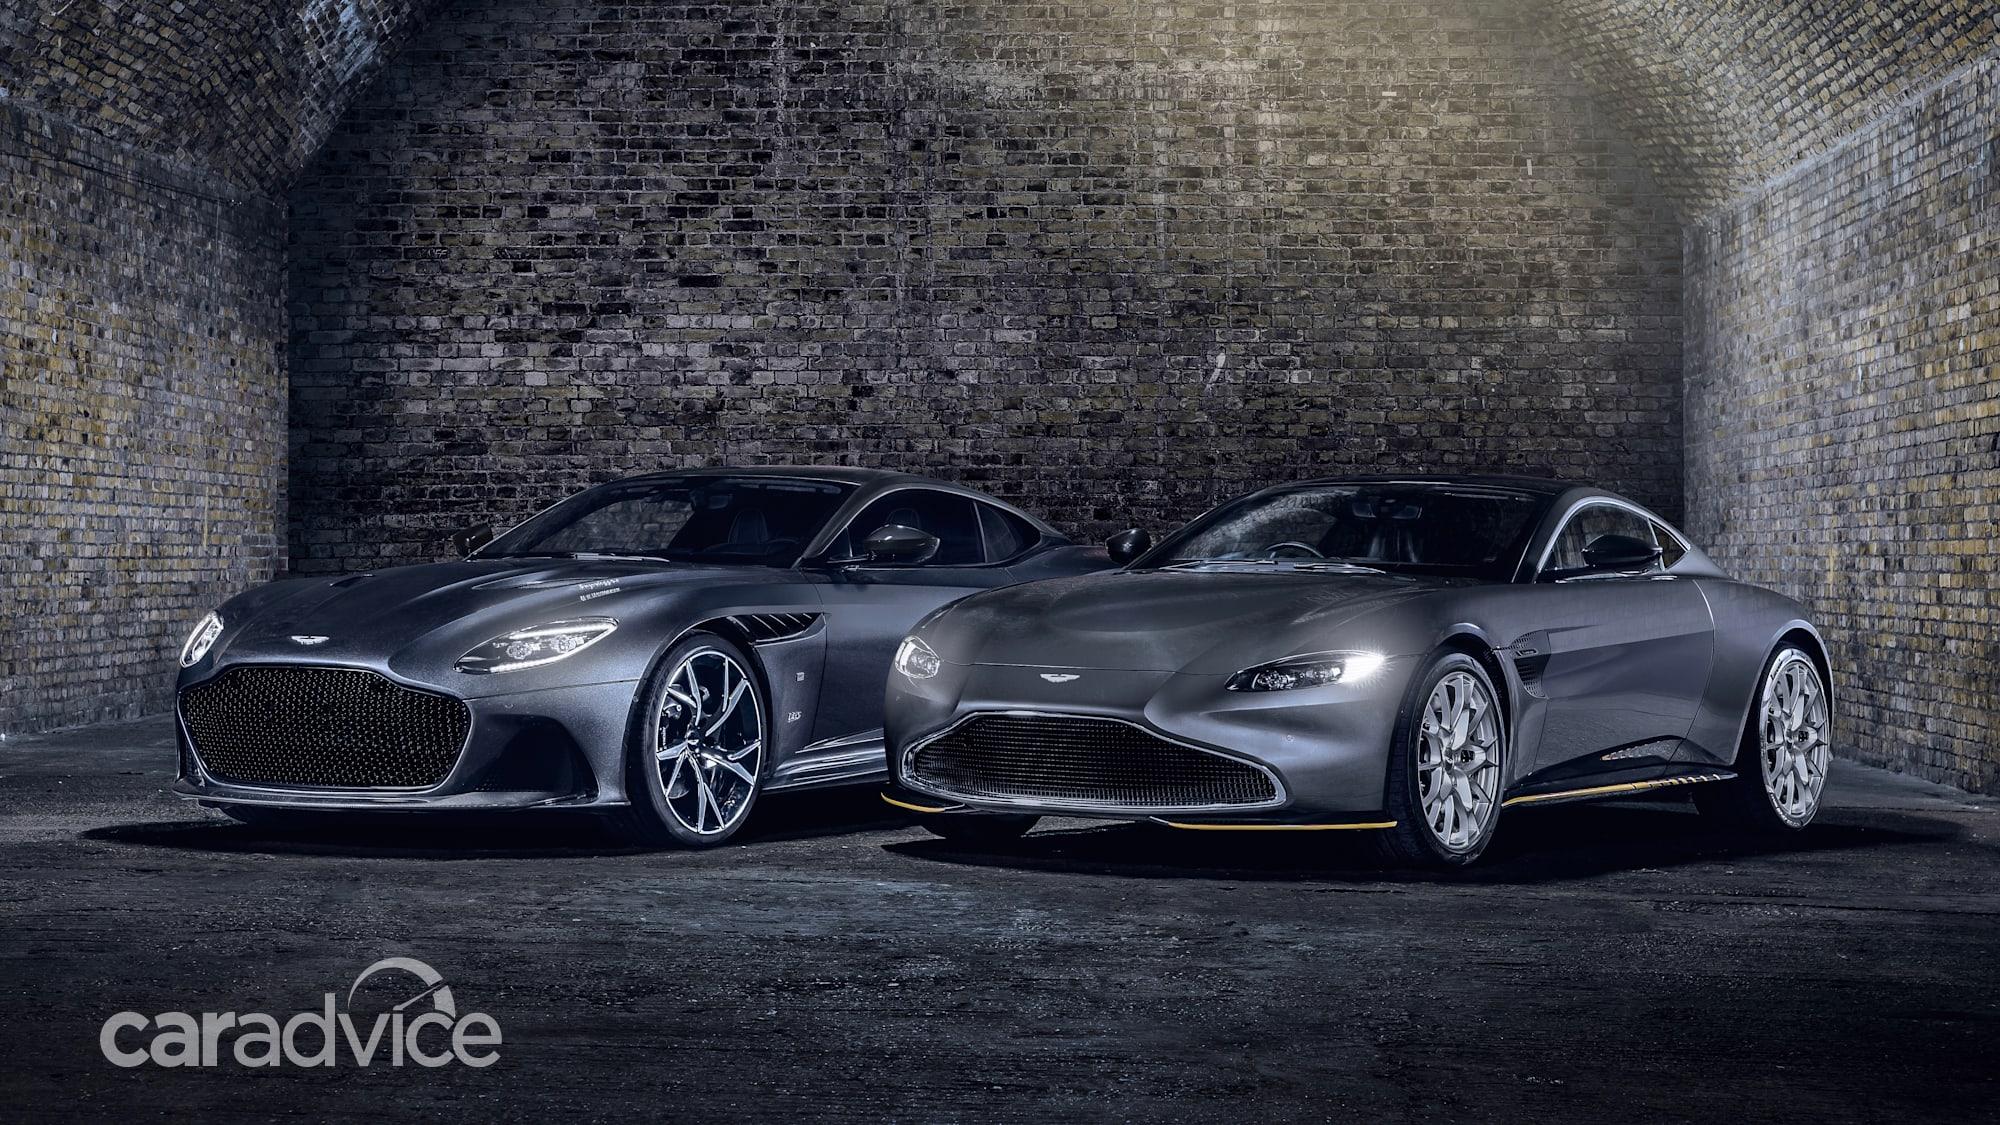 Aston Martin stocks rise and fall following Sebastian Vettel announcement - 2 of 2